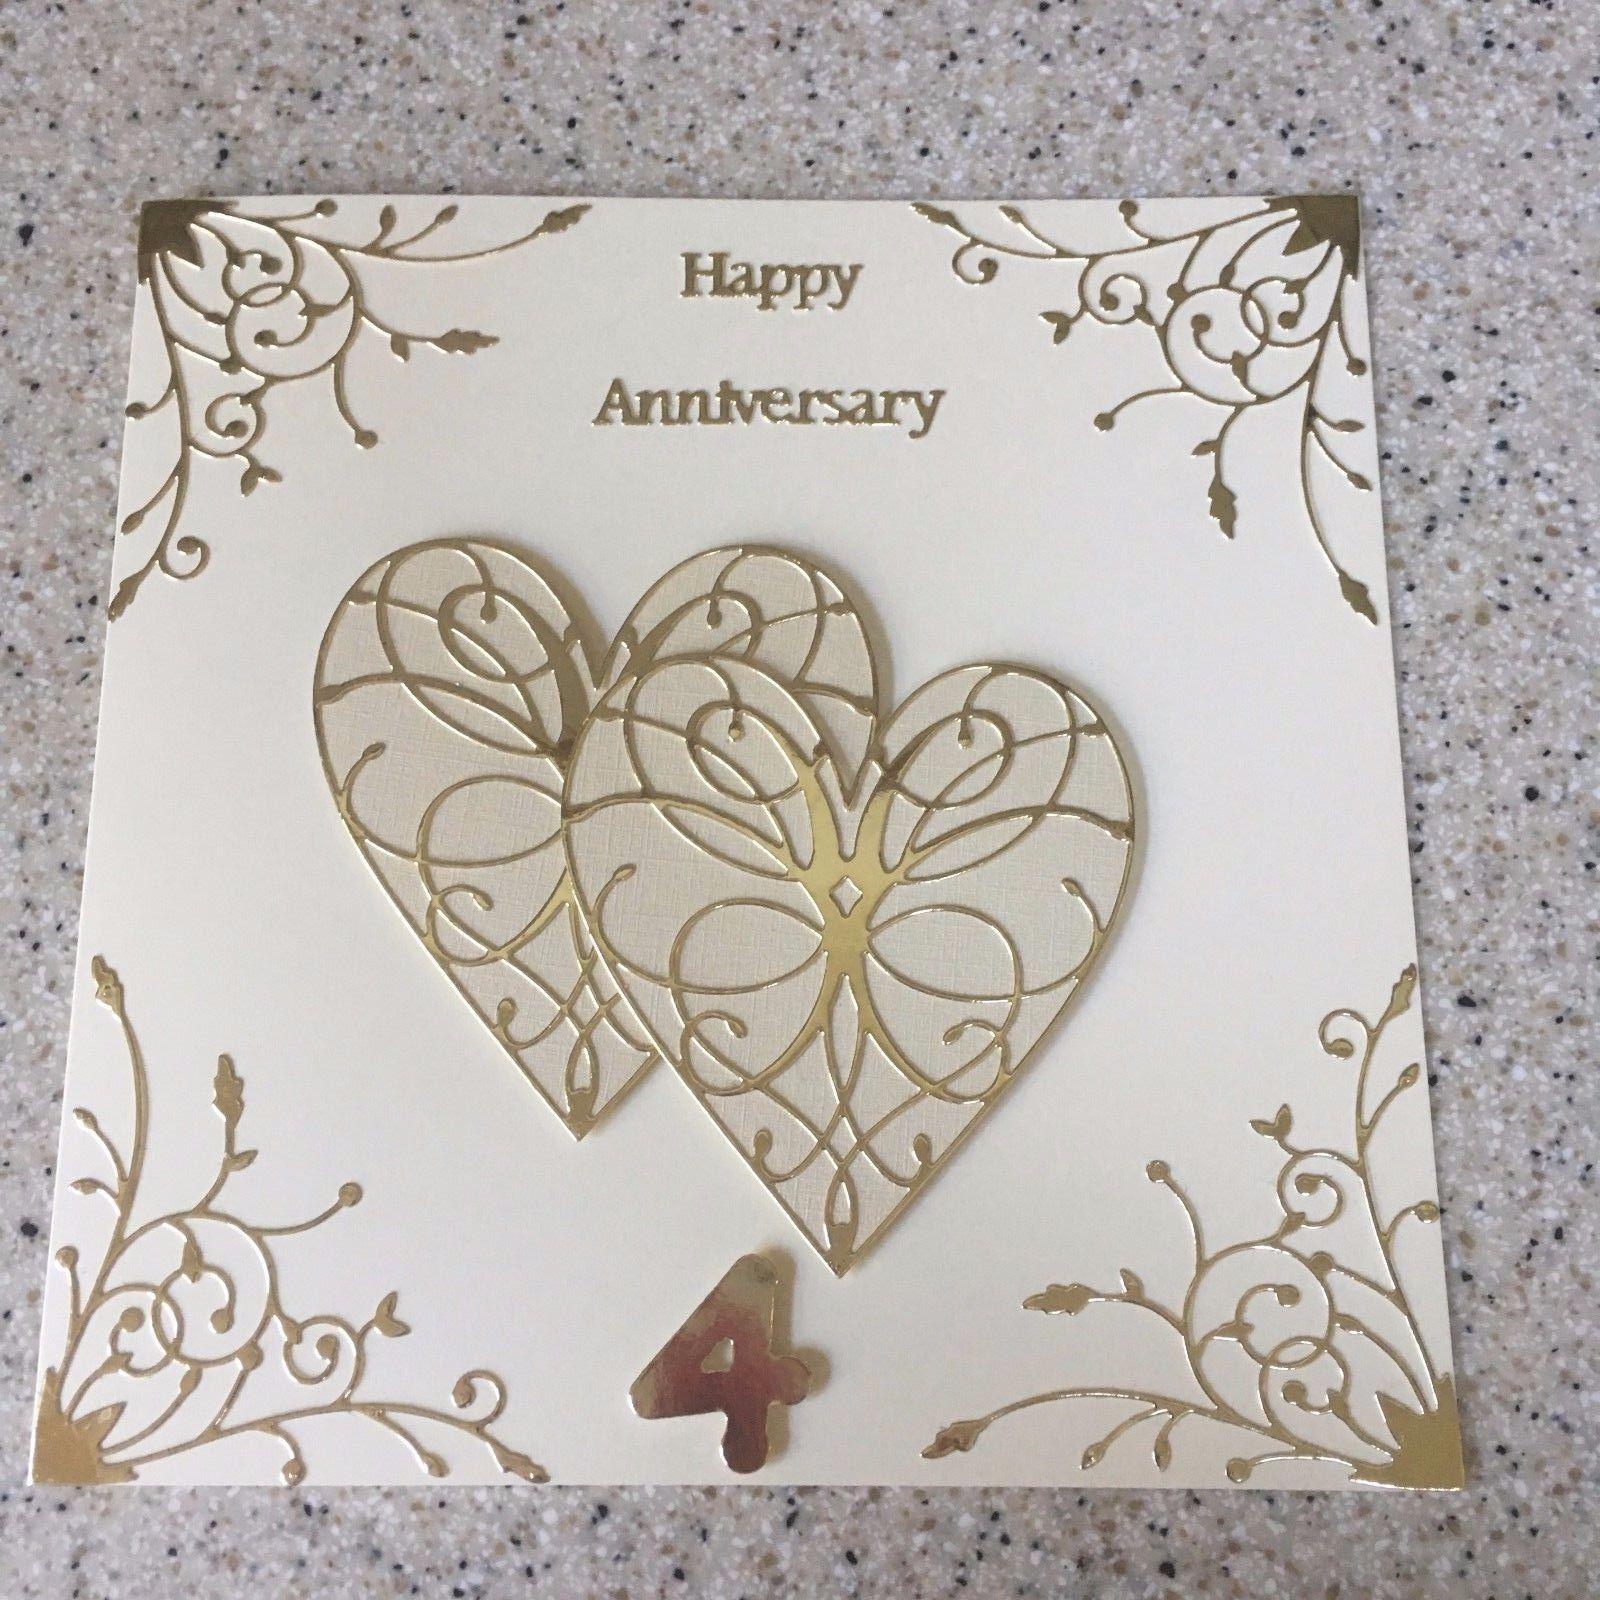 Handmade Linen Wedding Anniversary Card Happy 4th Wedding Anniversary Large 8 Wedding Anniversary Cards Wedding Anniversary Greeting Cards Anniversary Greeting Cards